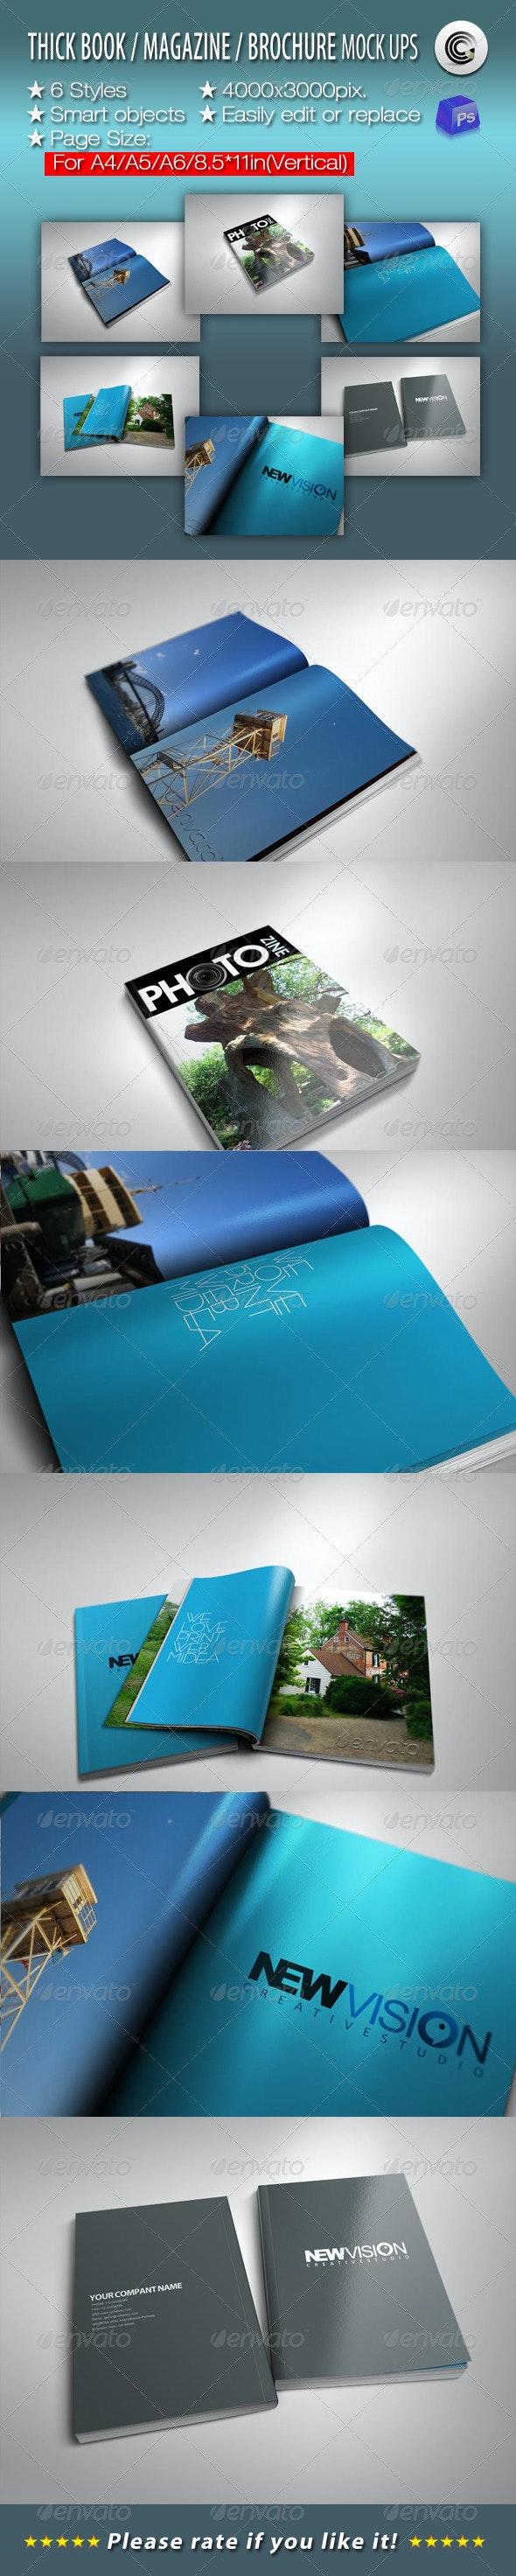 Thick Book Magazine Brochure Mock-ups - Magazines Print